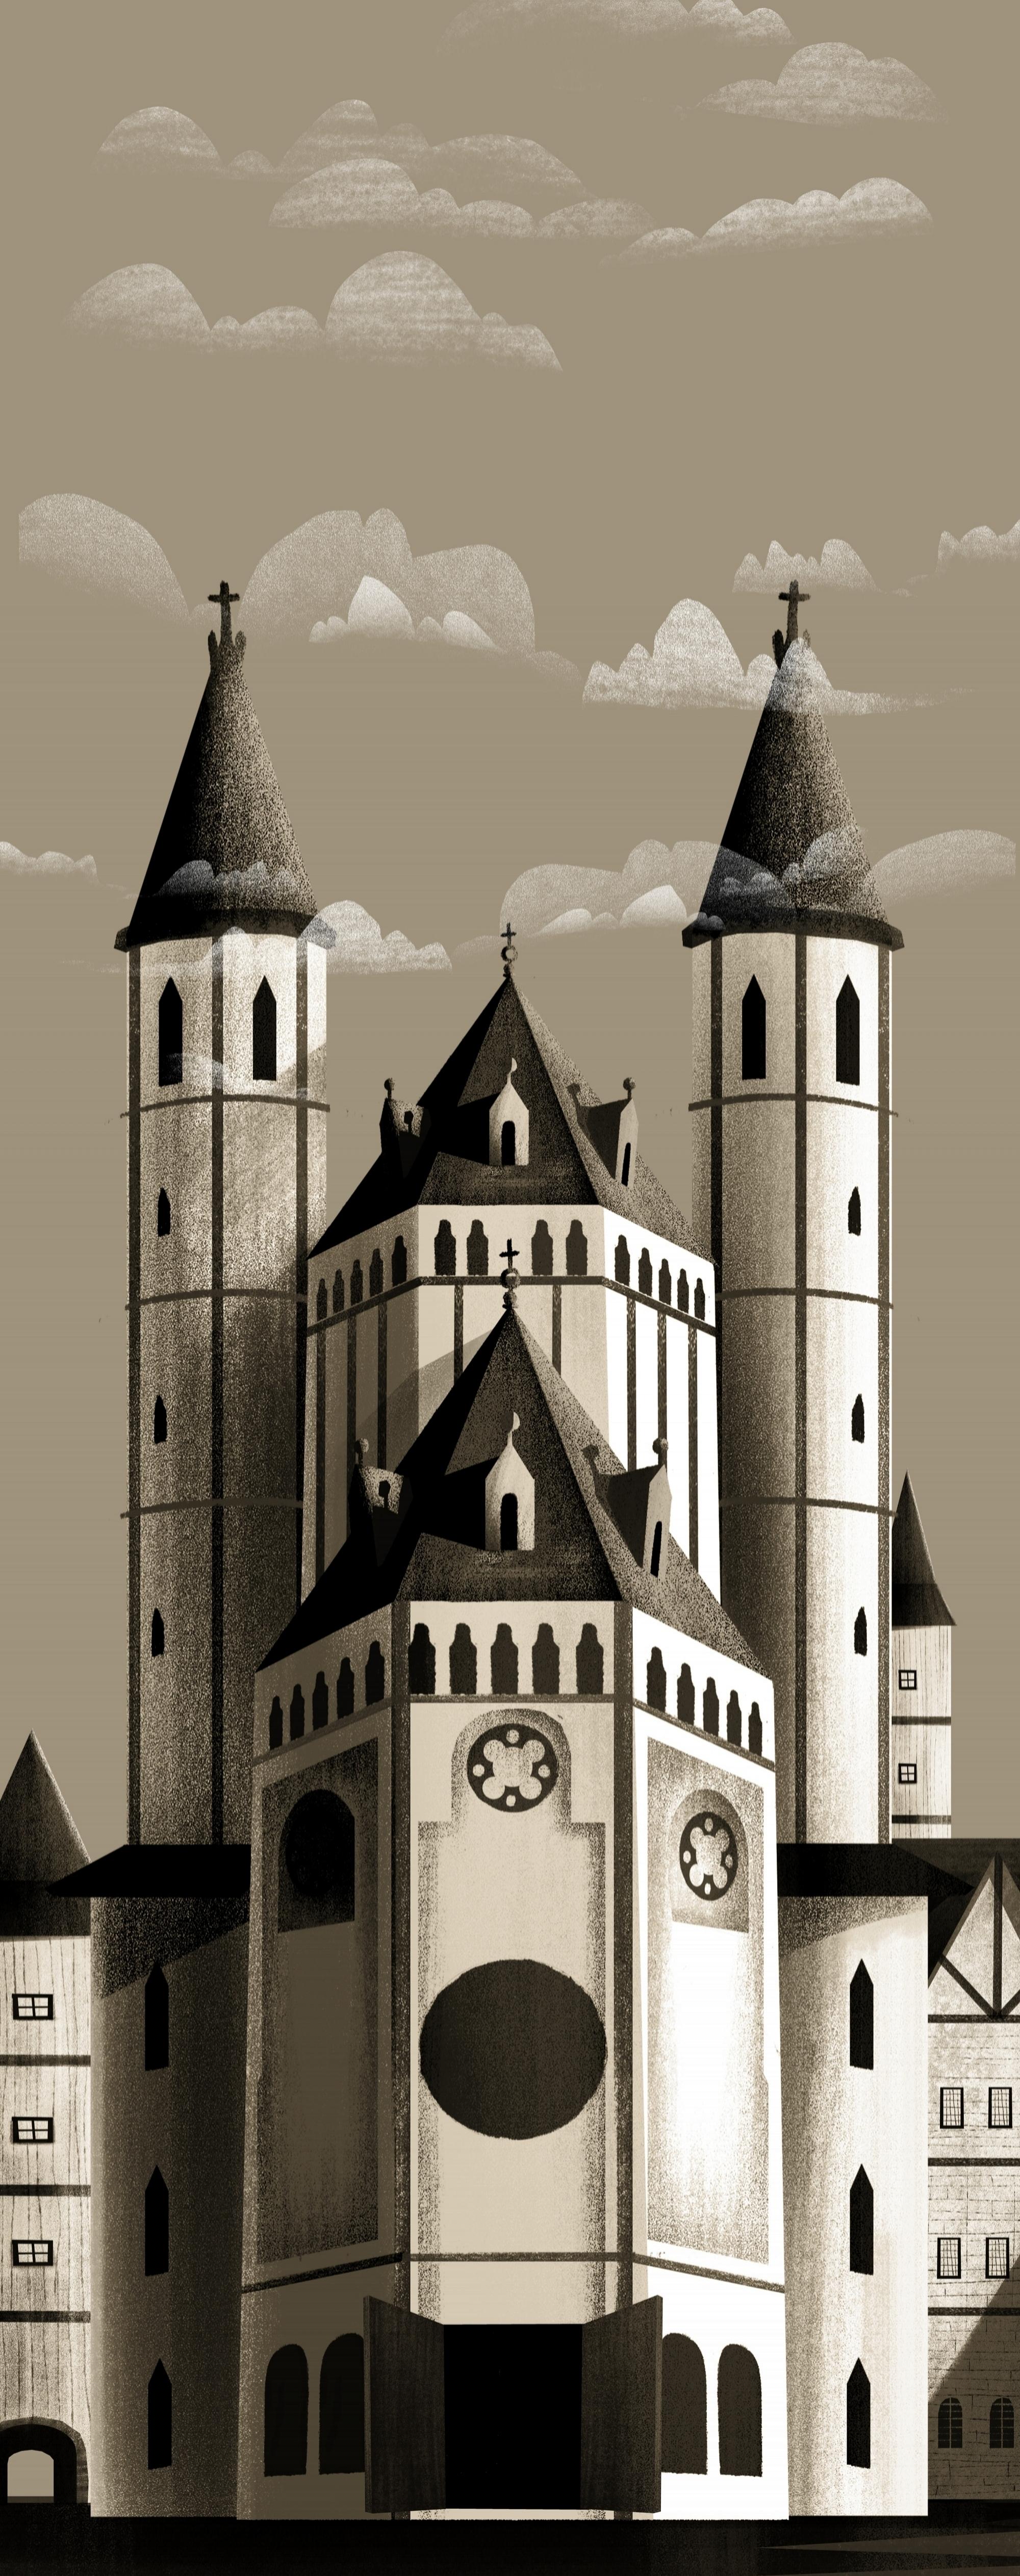 Illustration_concept_7_church_SH04.jpg